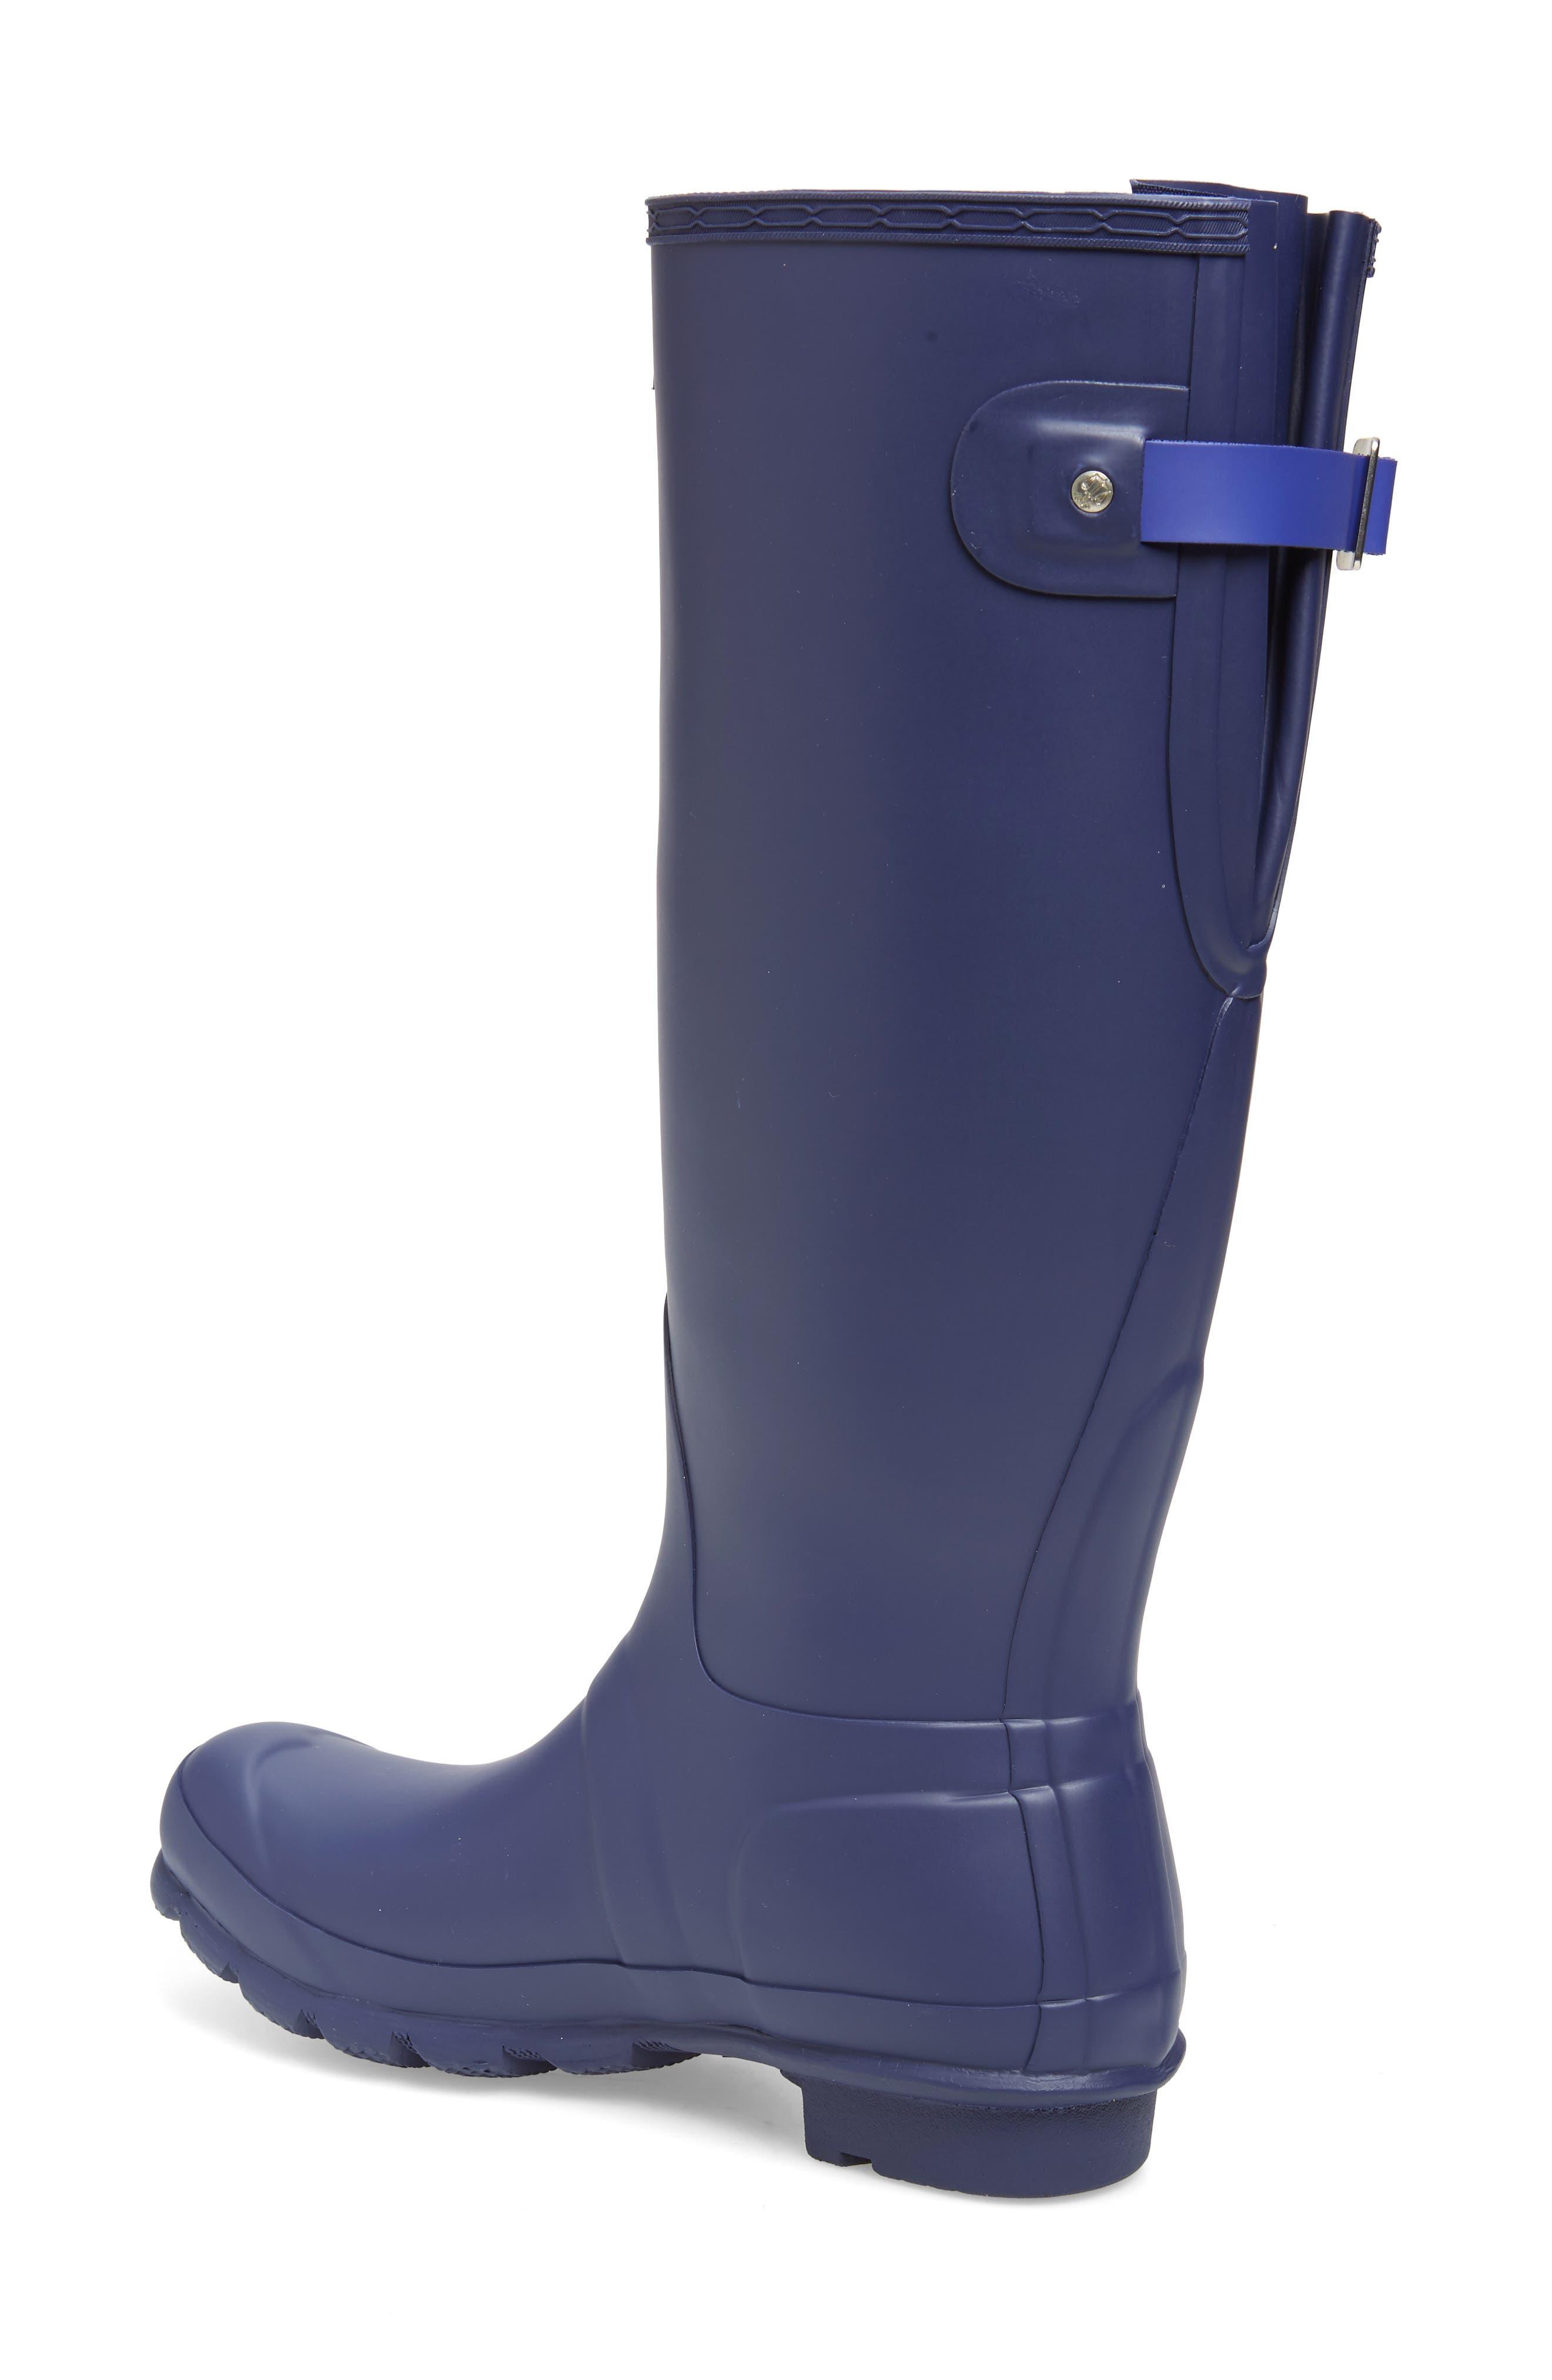 80c8859a19b Women's Blue Rain Boots | Nordstrom